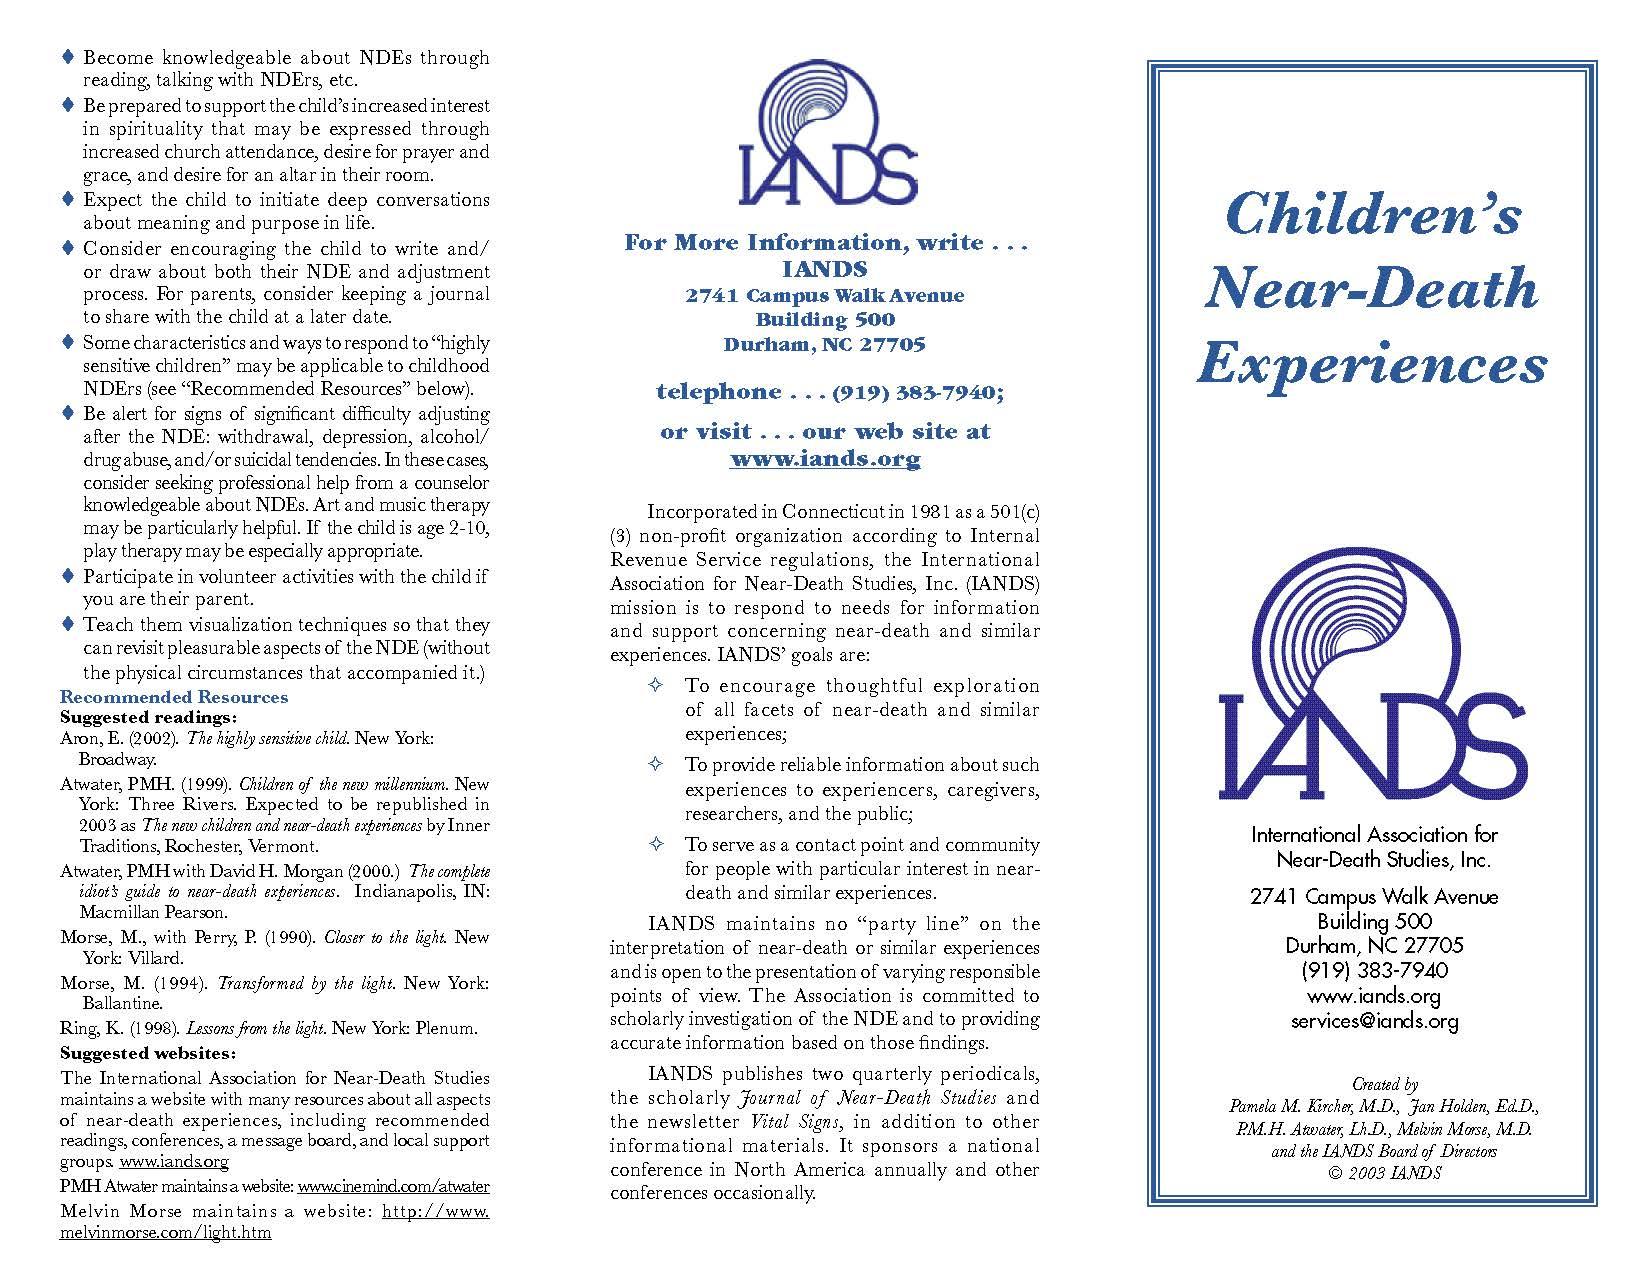 NDEs of Children_Page_2.jpg